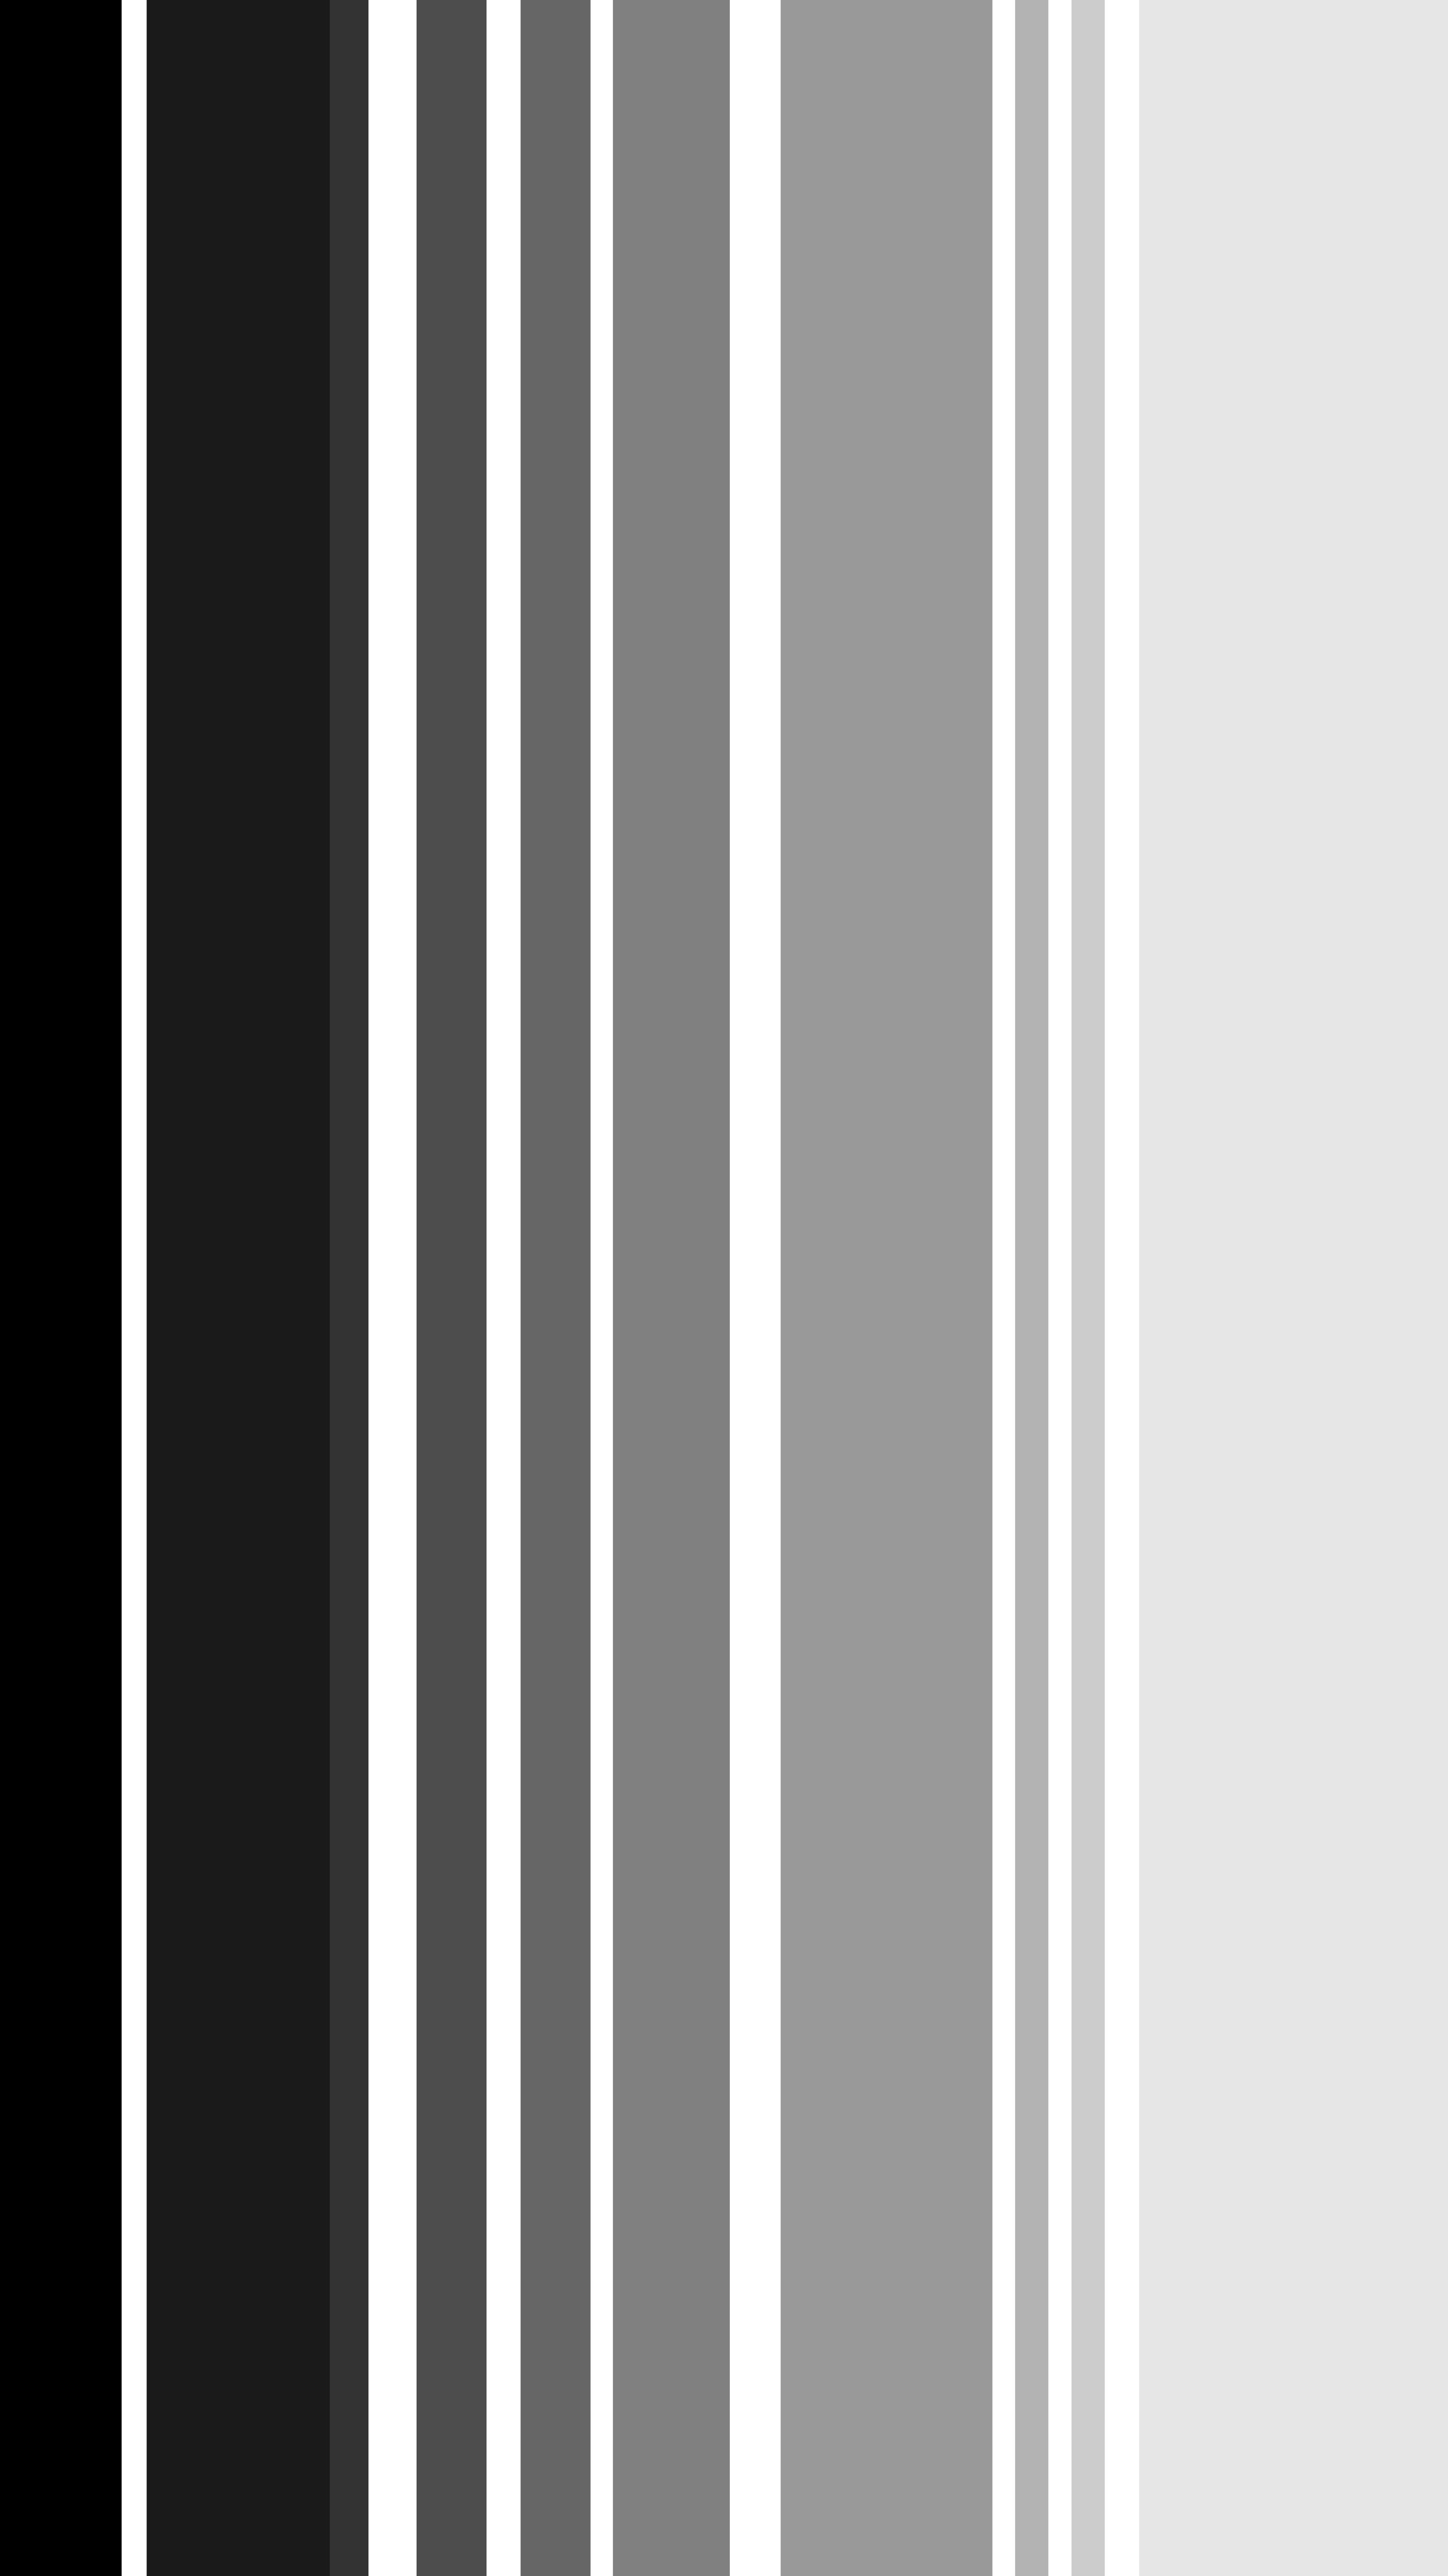 Gradient Black White Stripe Phone Background Black And White Striped Background Black White Stripes